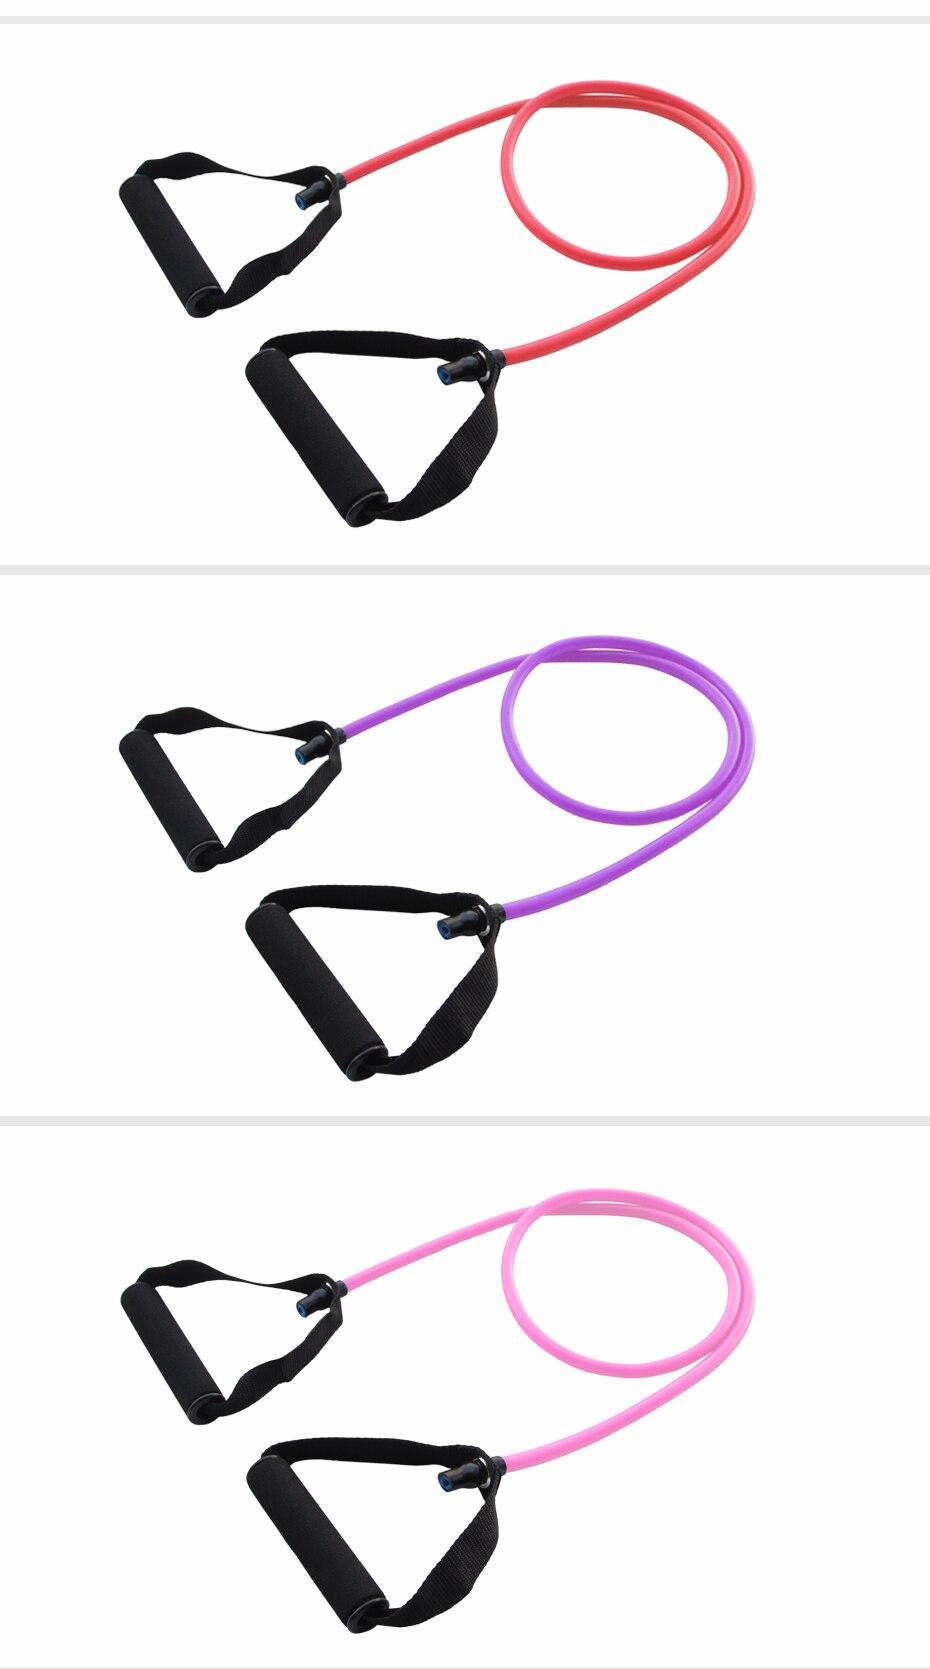 120cm Elastic Resistance Bands Yoga  (24)